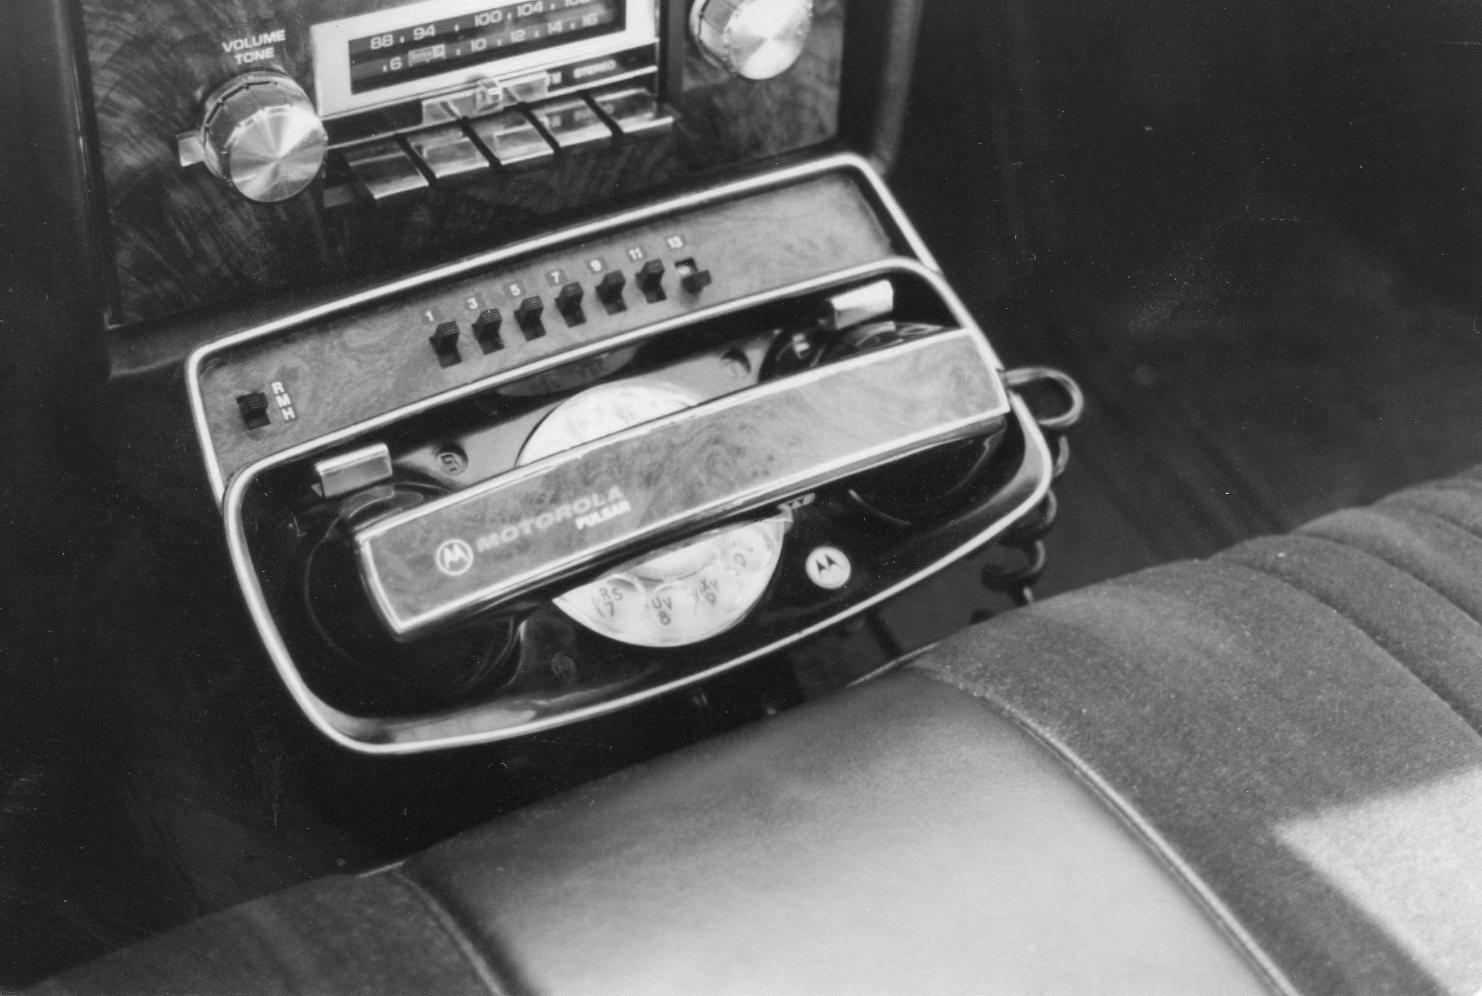 My first car phone, a Motorola Pulsar I, 1980.